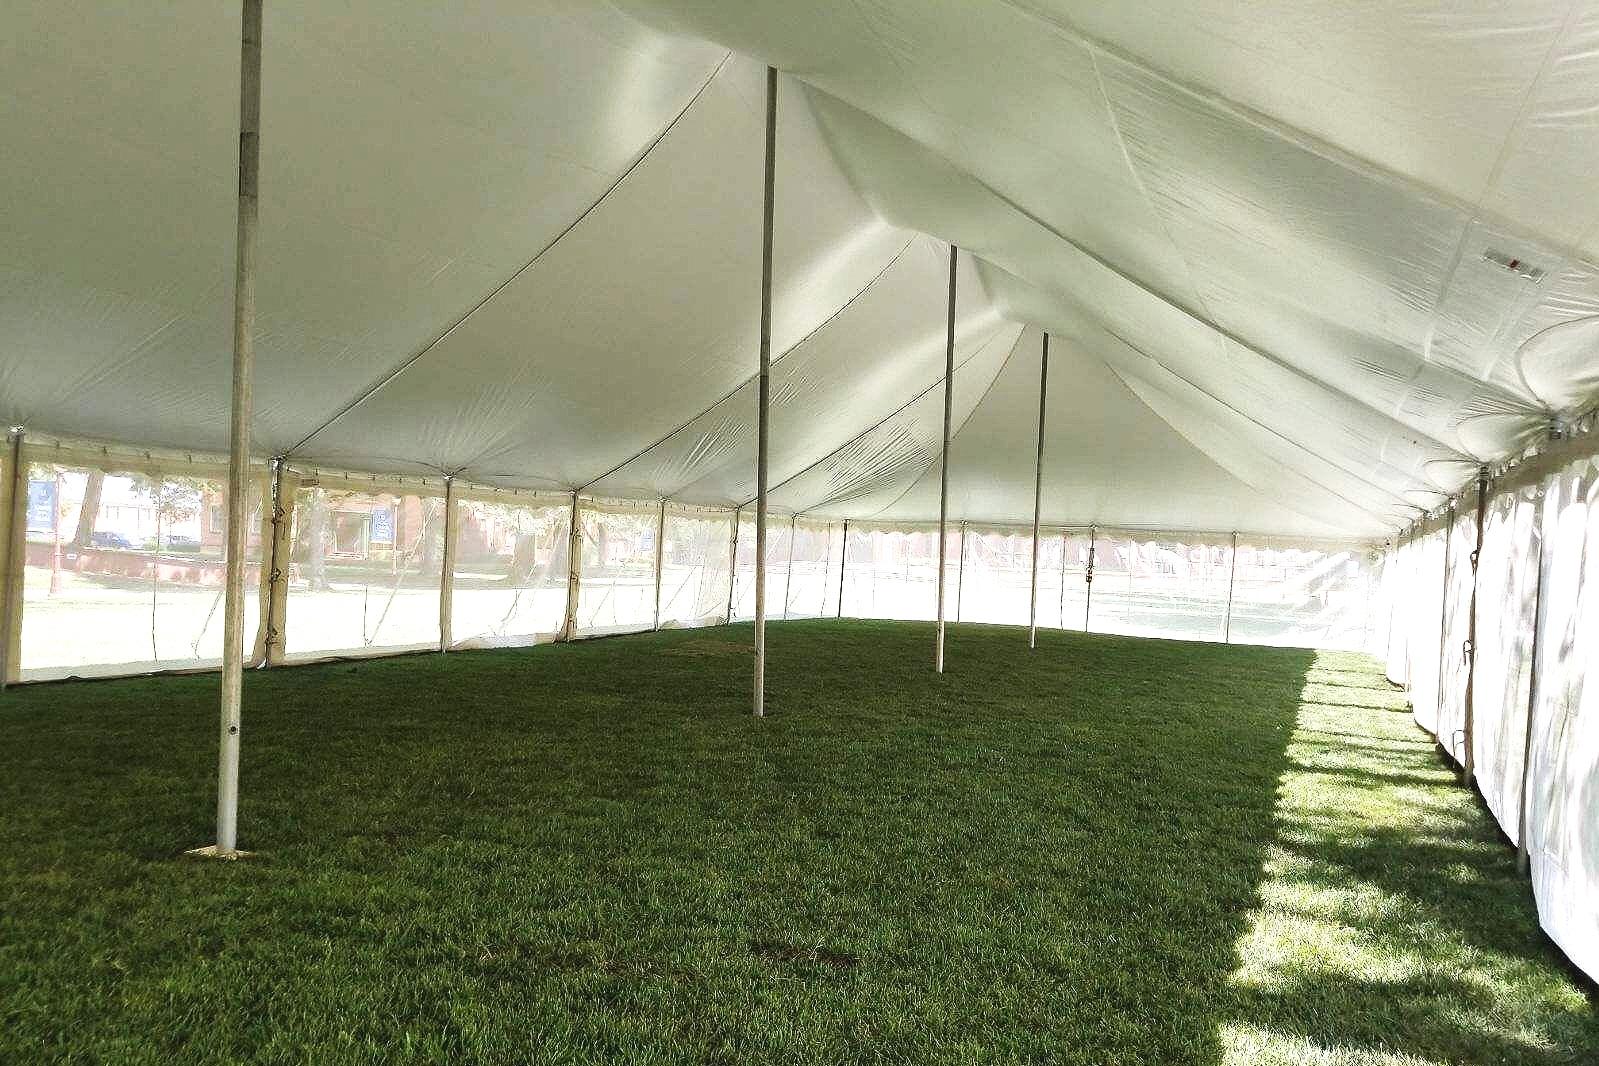 40 X 100 Pole Tent - Union Presbyterian